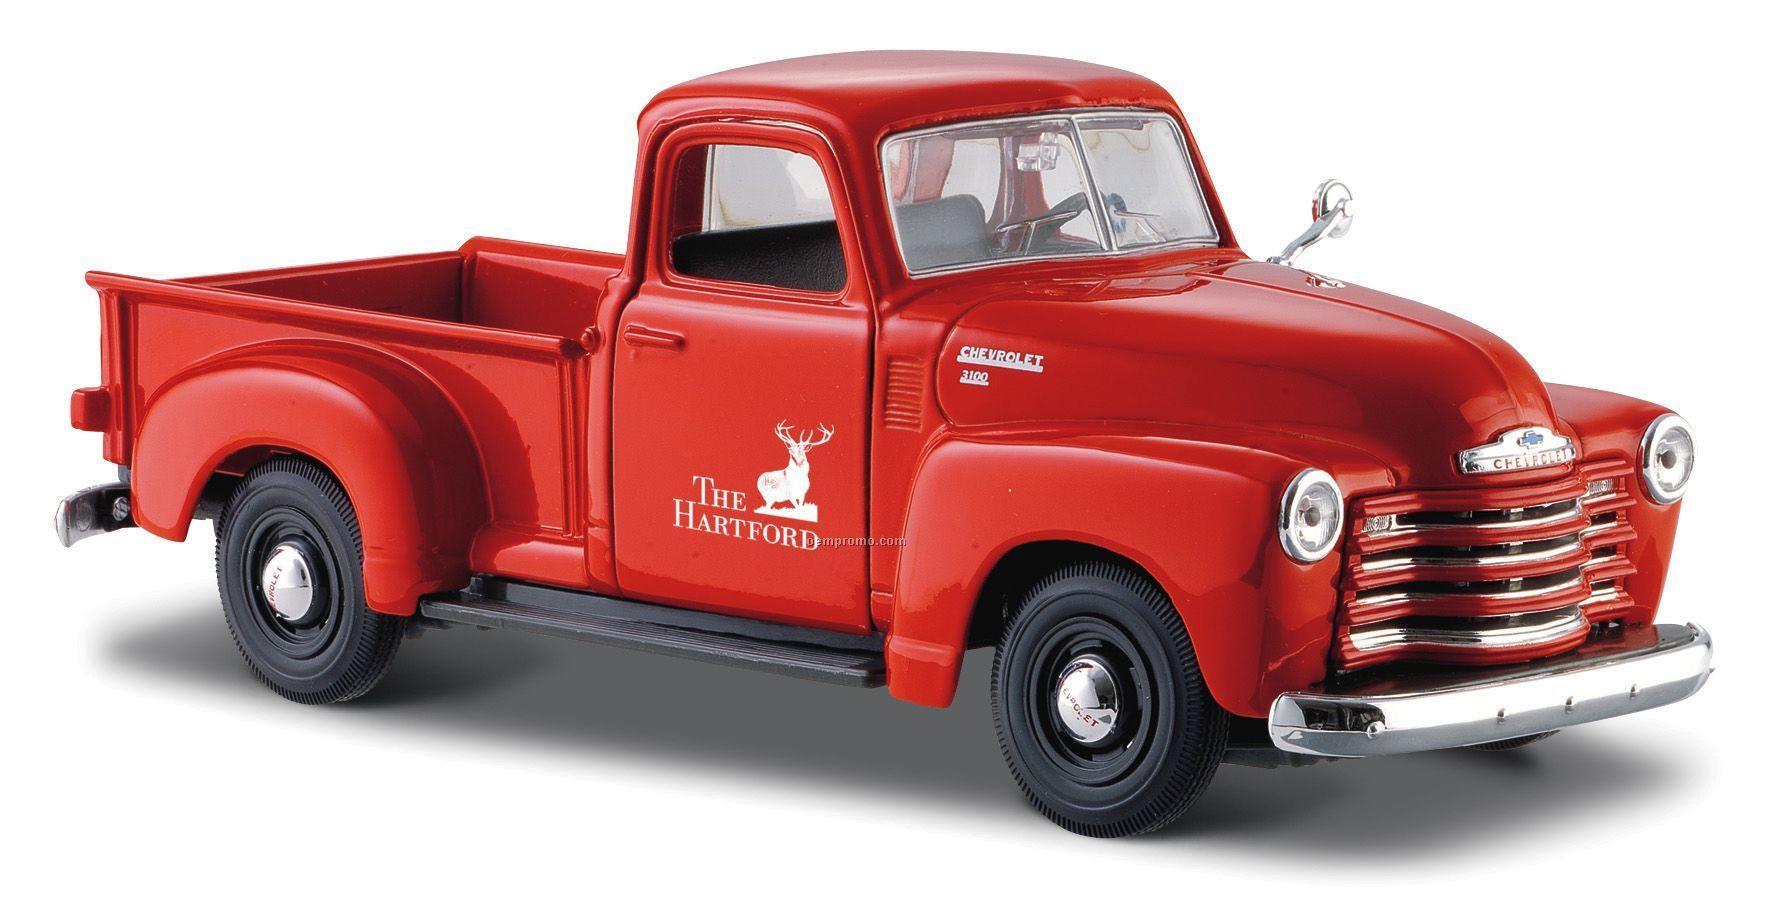 7x 2 1 2x3 1950 Chevrolet 3100 Pickup Die Cast Replicachina 1941 Gmc Truck